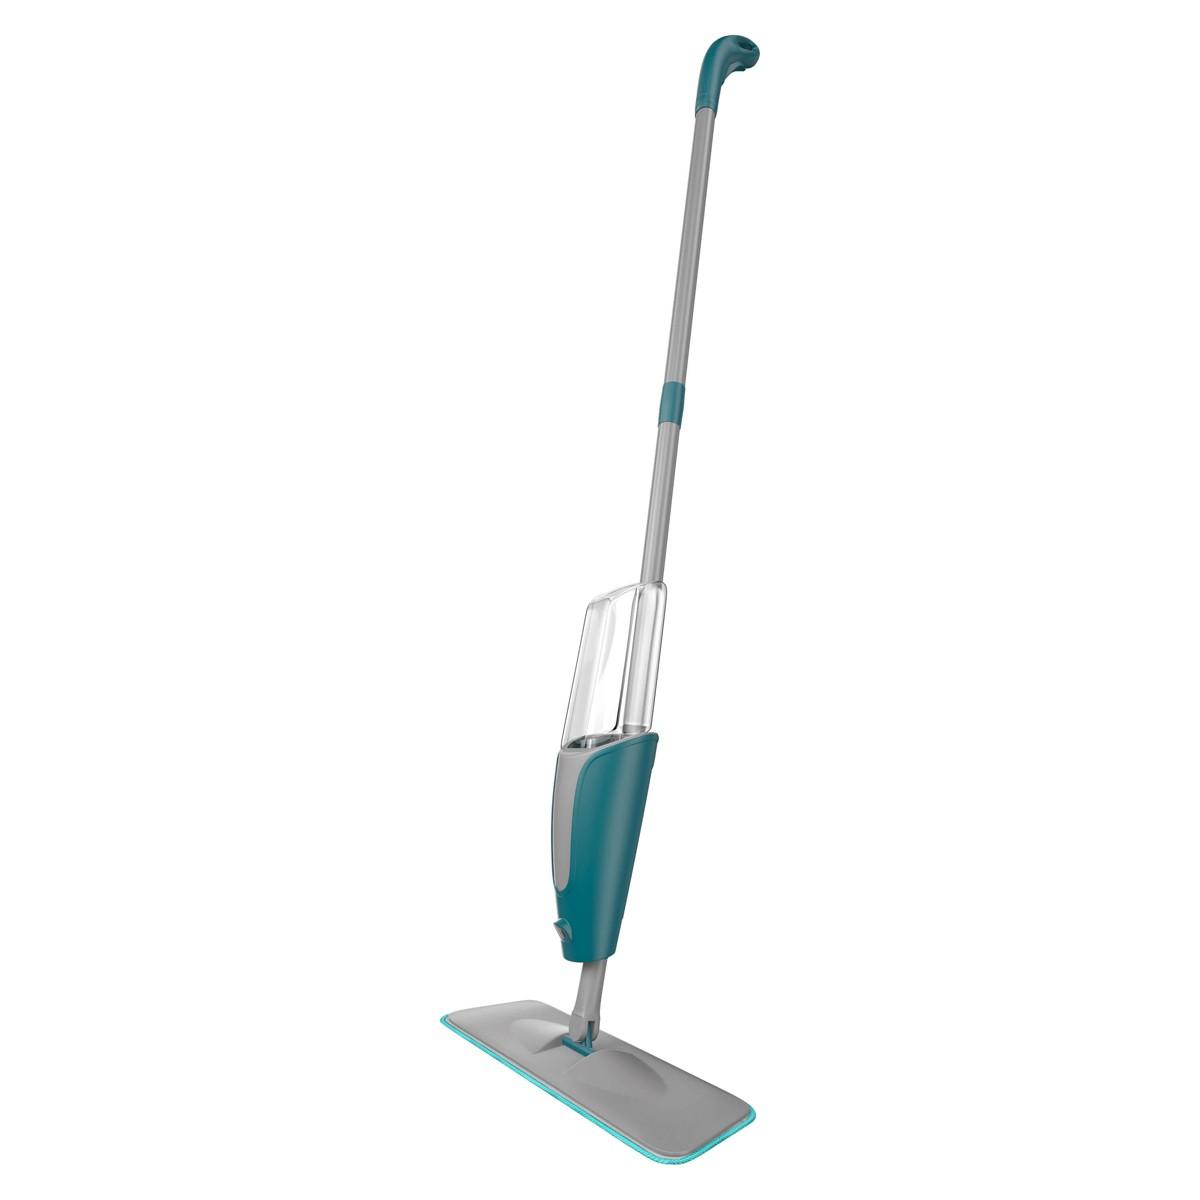 Mop Spray FlashLimp MOP7800